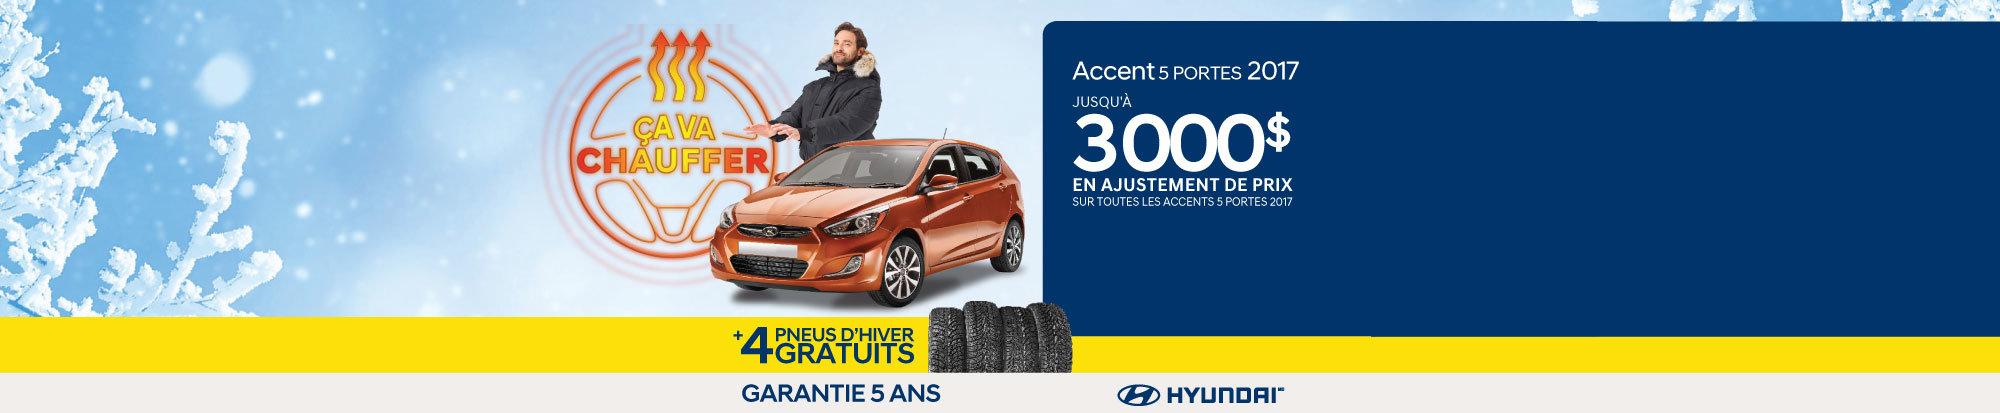 Hyundai Accent web